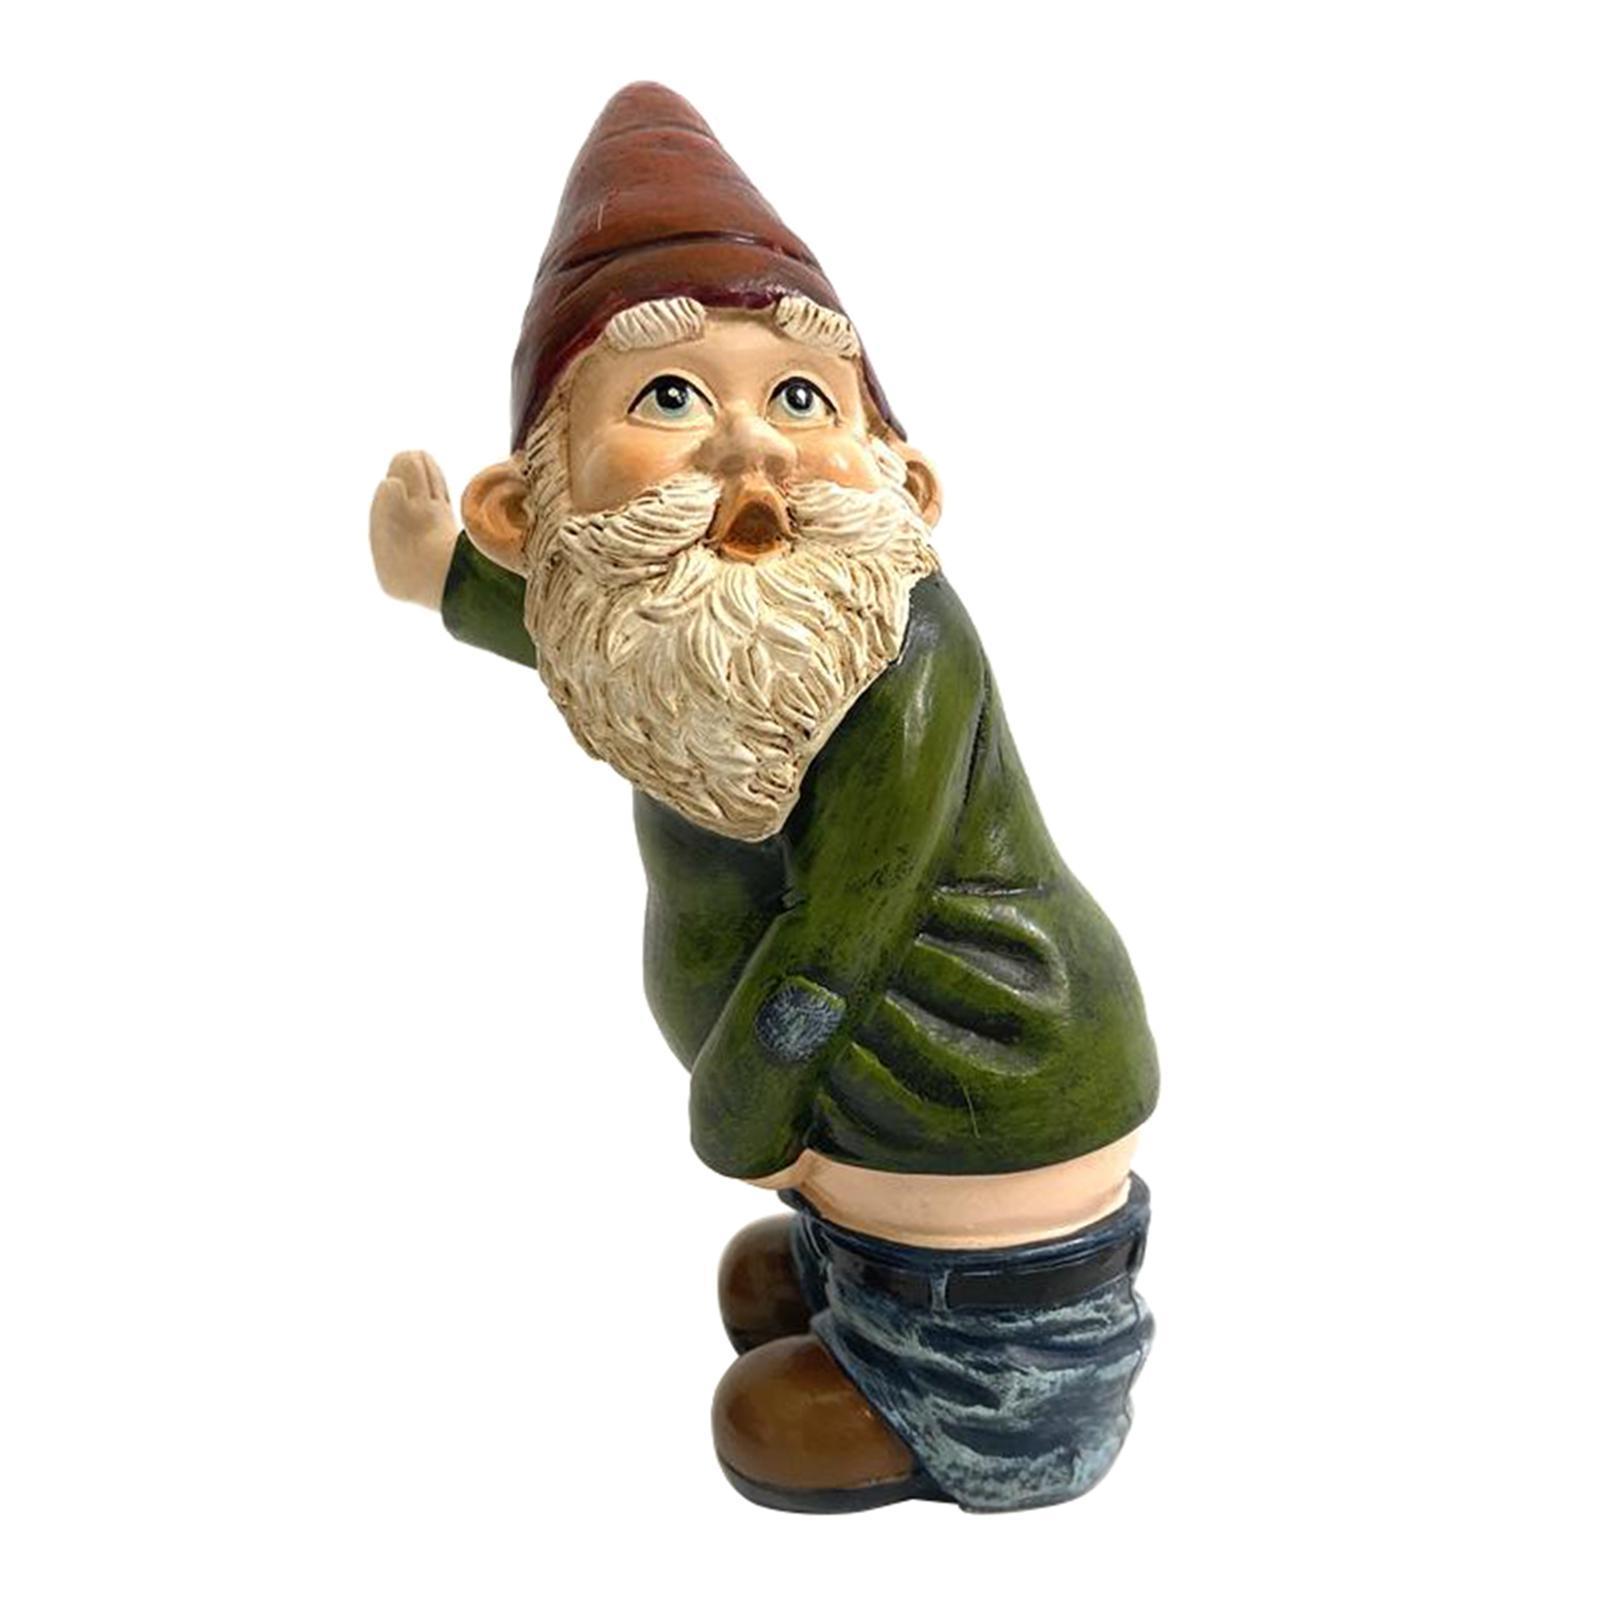 thumbnail 3 - Funny Resin Naughty Garden Gnome Statue Ornaments Villa Home Figurines Decor